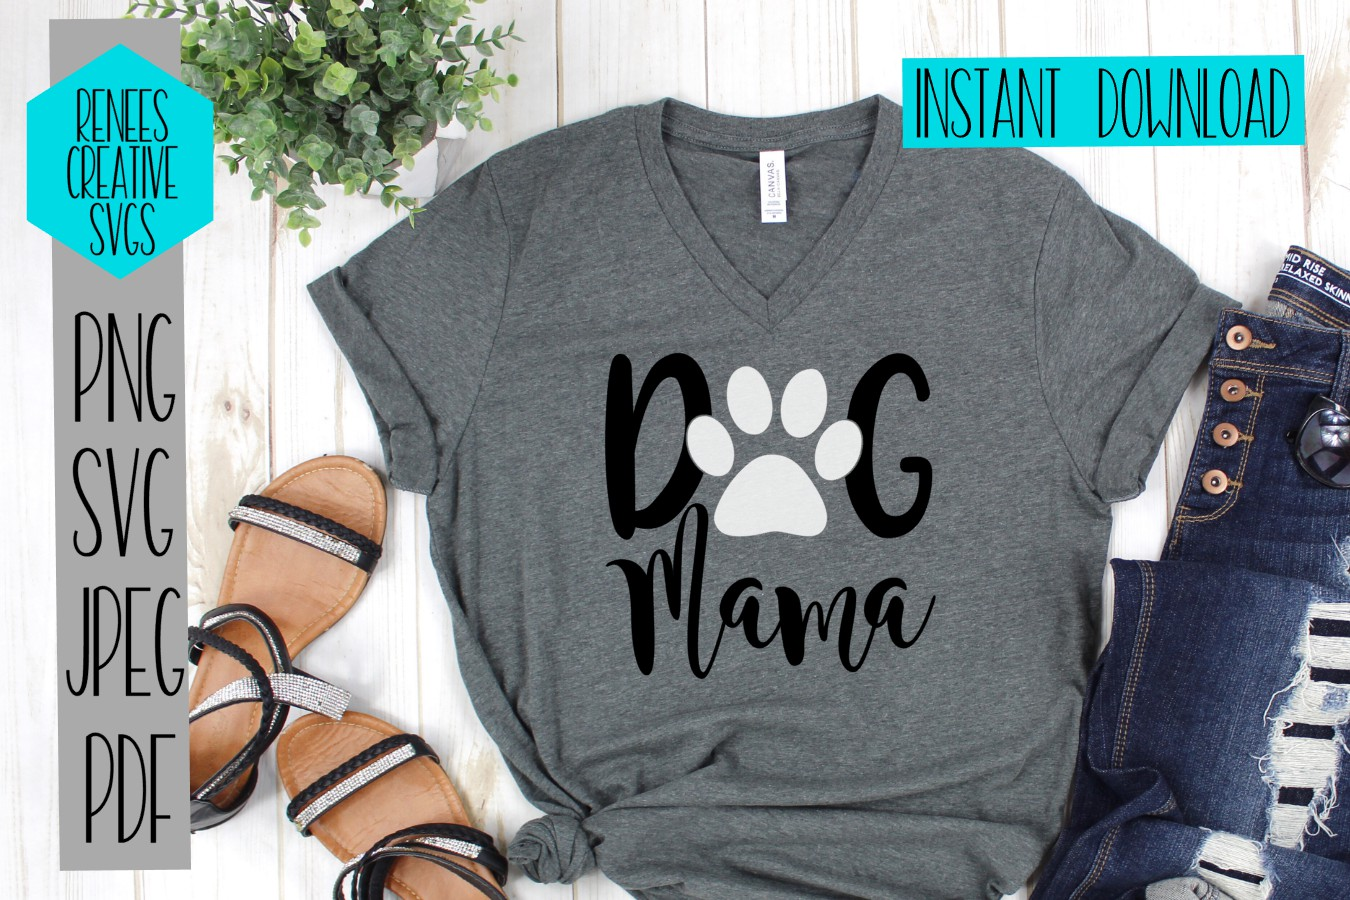 Dog Mama | Pet SVG | SVG Cut File example image 2